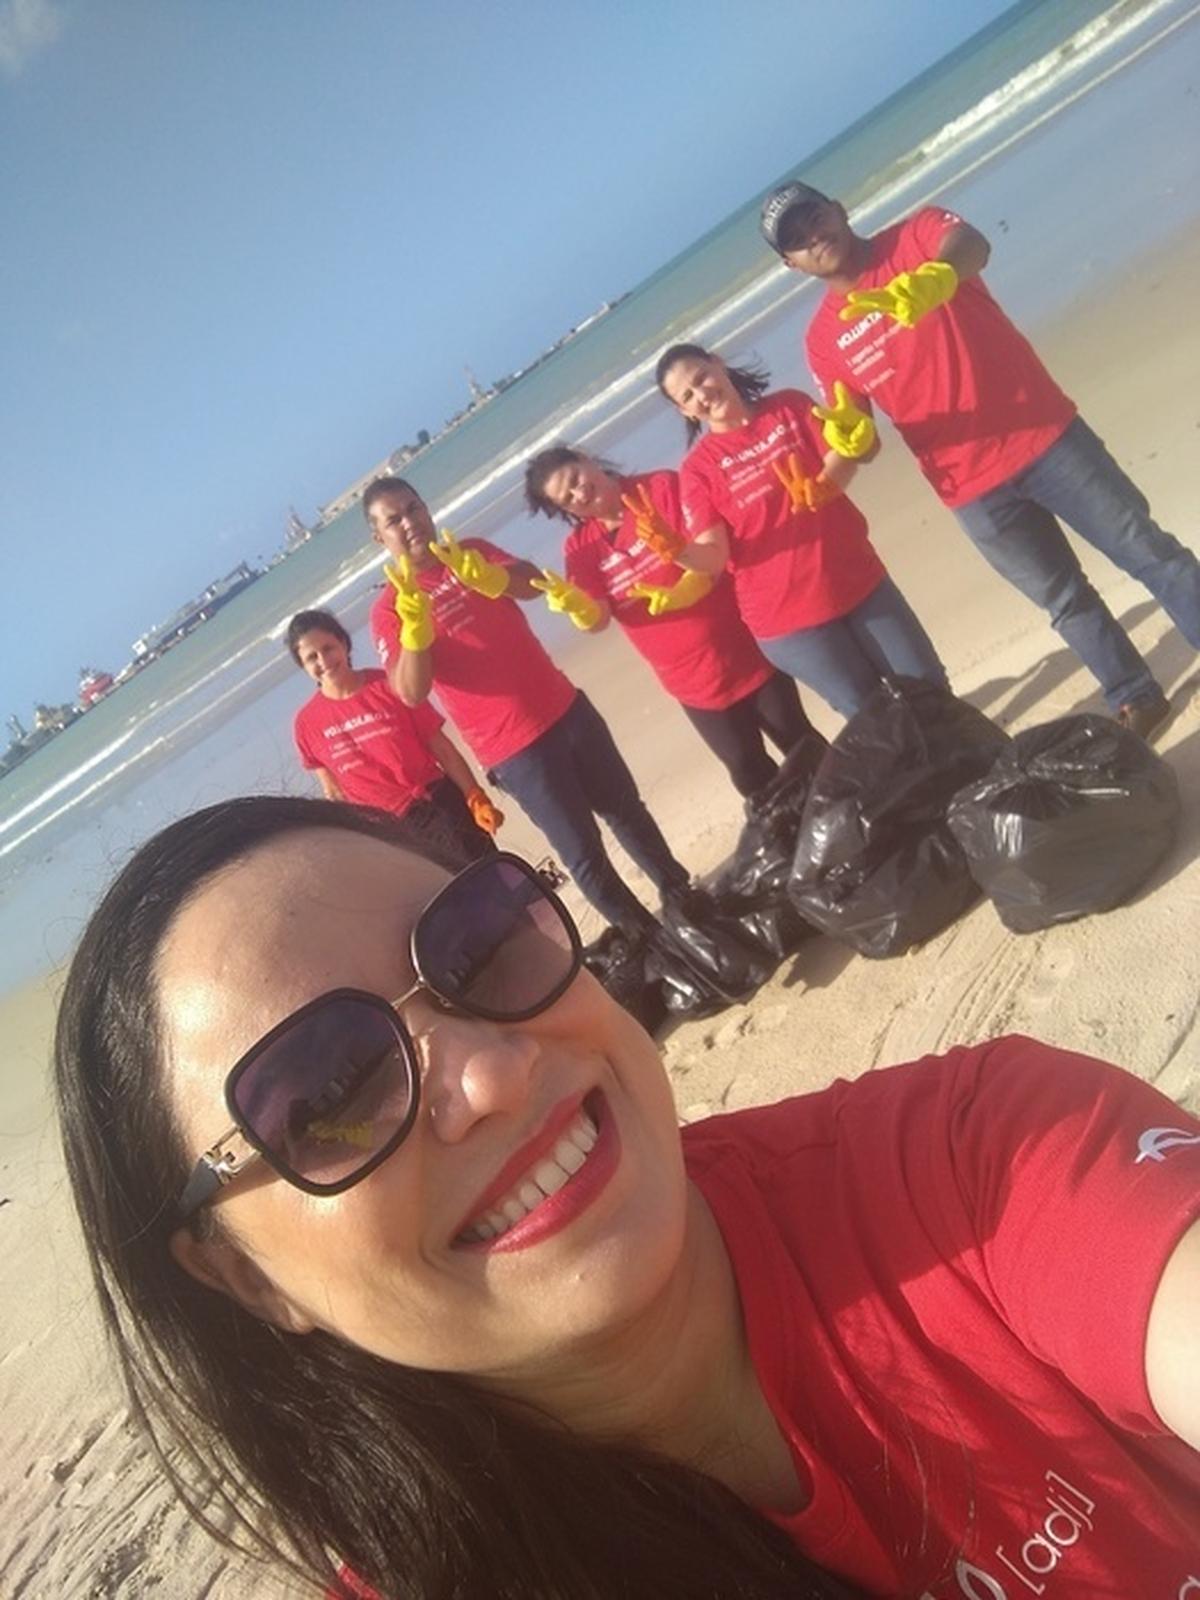 Mês do Meio Ambiente 2019 - Praia Limpa (Maceió)